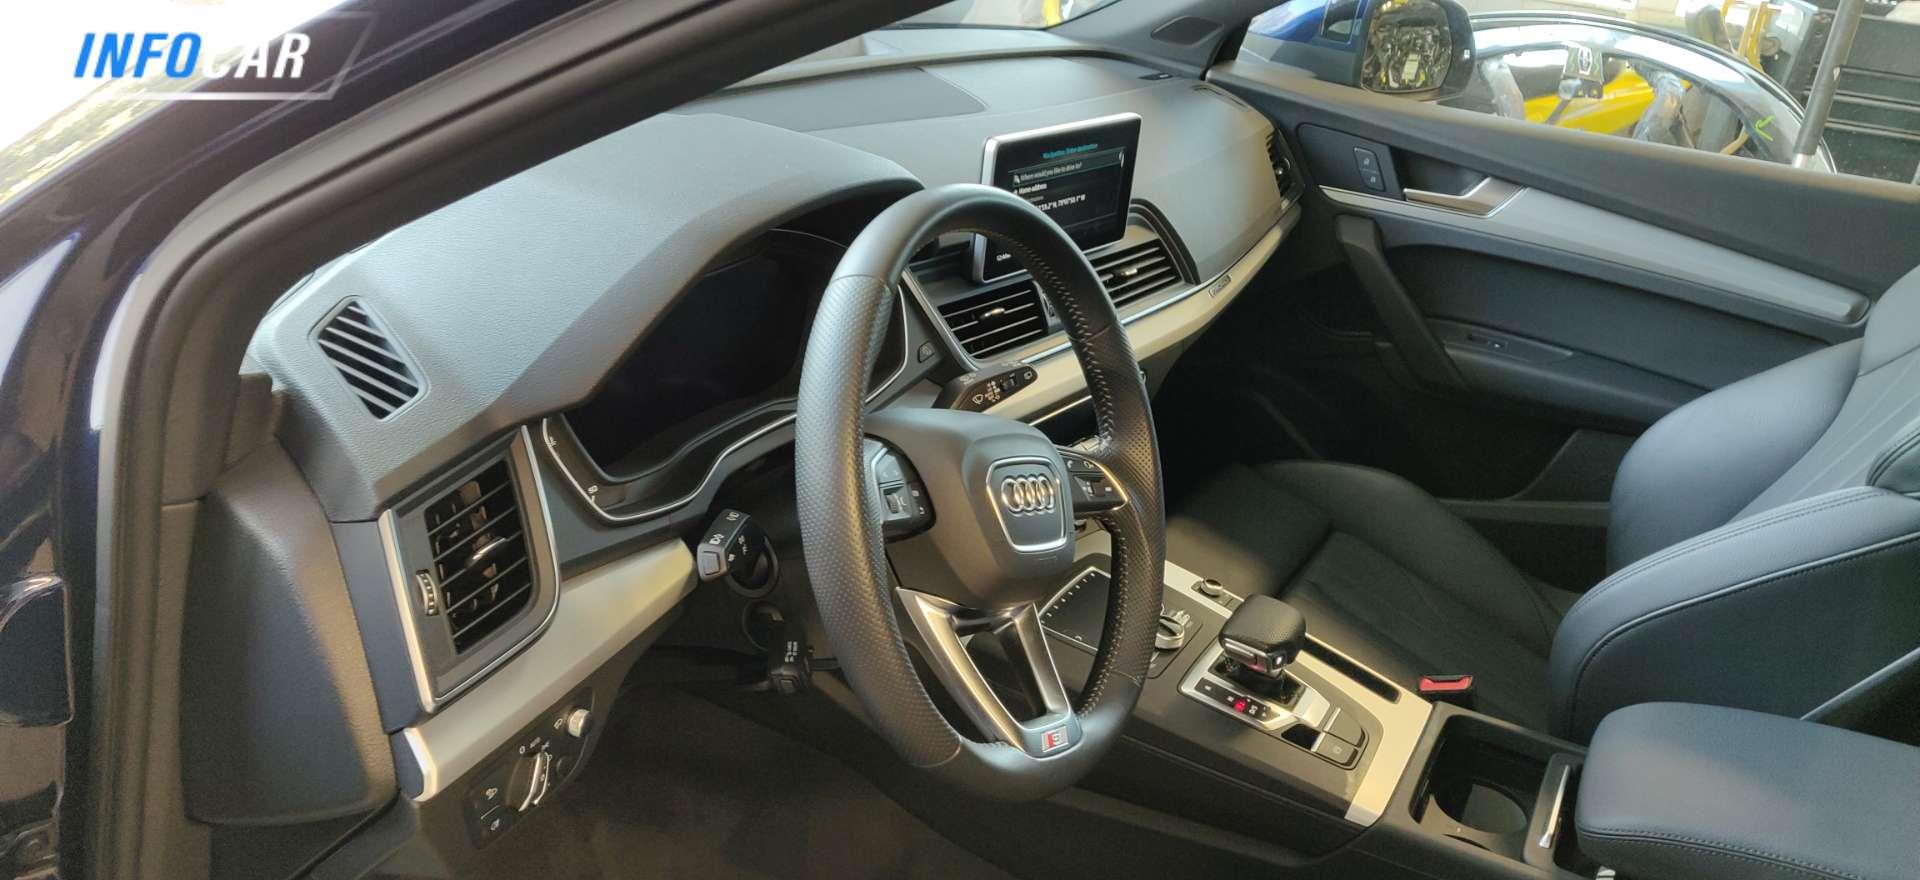 2018 Audi Q5 Technik - INFOCAR - Toronto's Most Comprehensive New and Used Auto Trading Platform